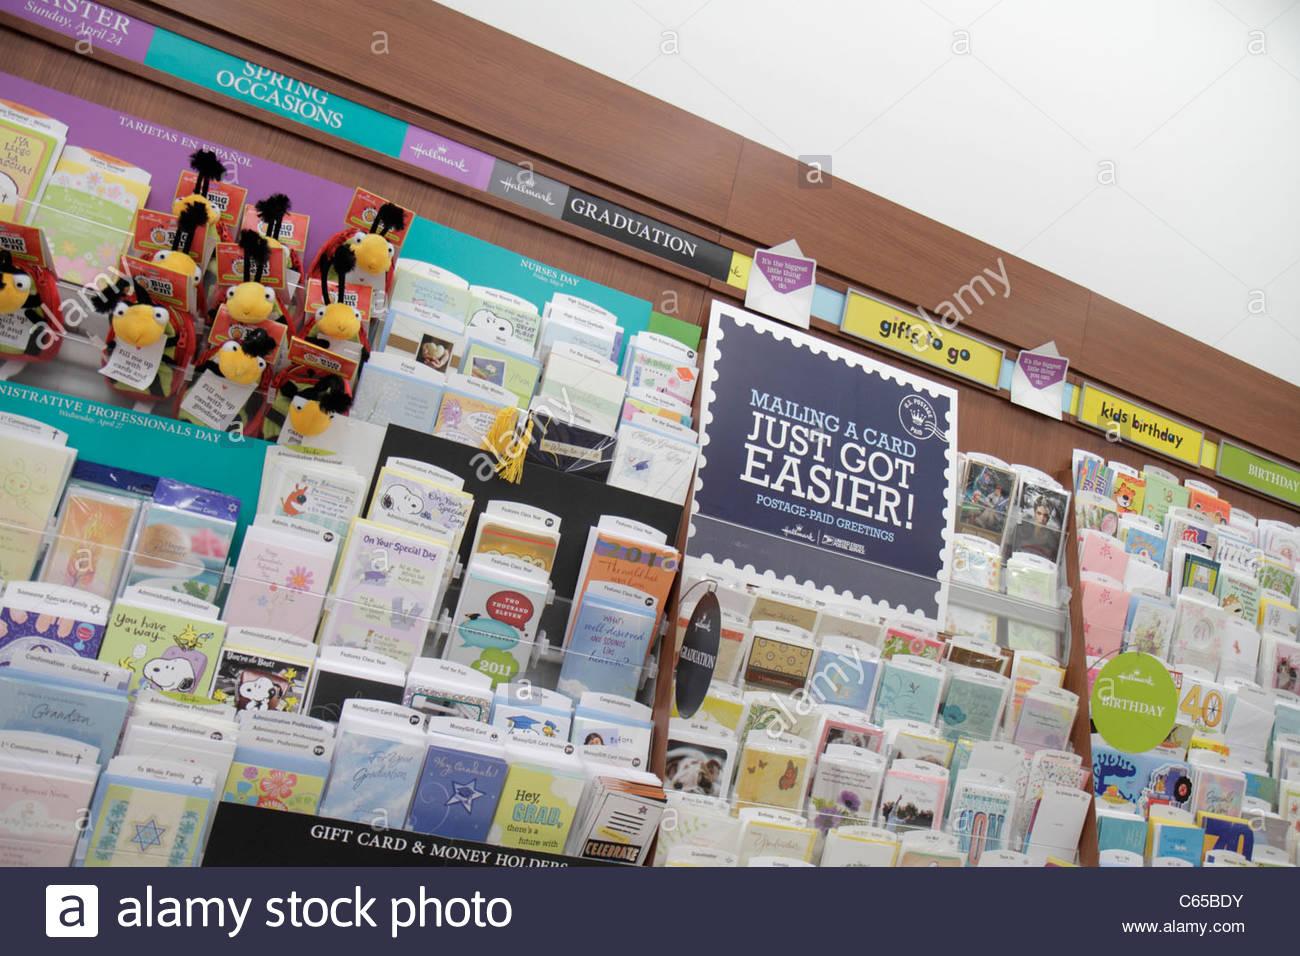 Miami Beach Florida Walgreens business drugstore chain pharmacy ...